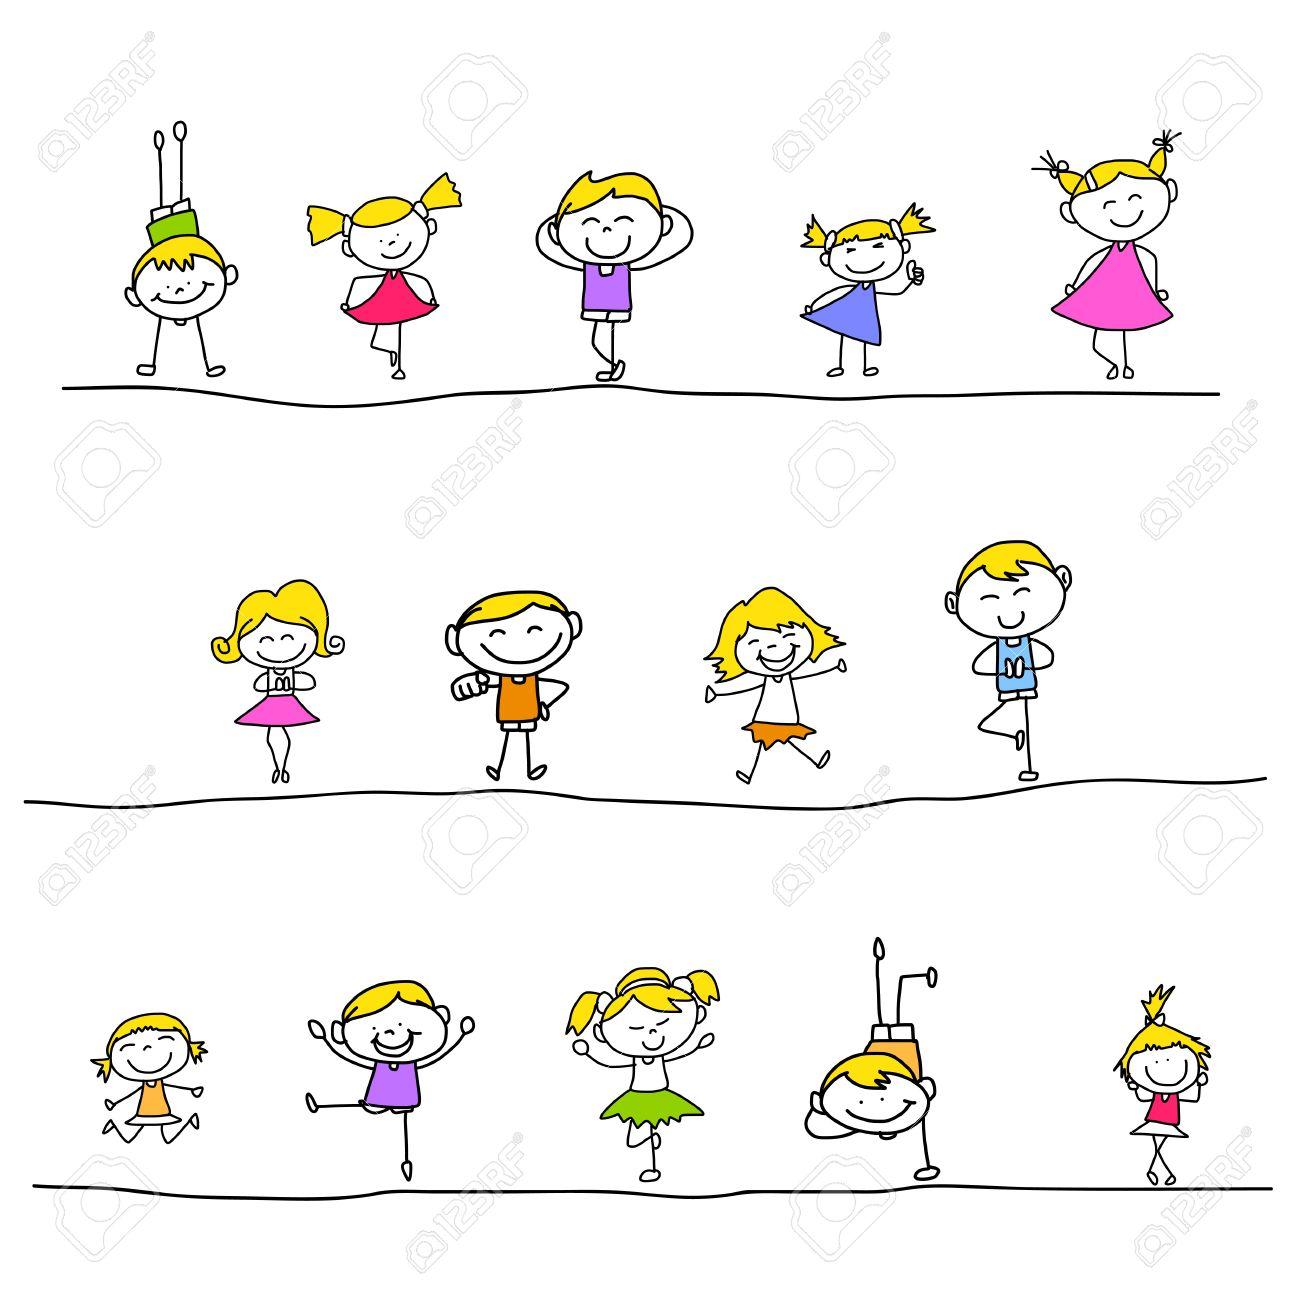 hand drawing cartoon happy kids playing - 21186905